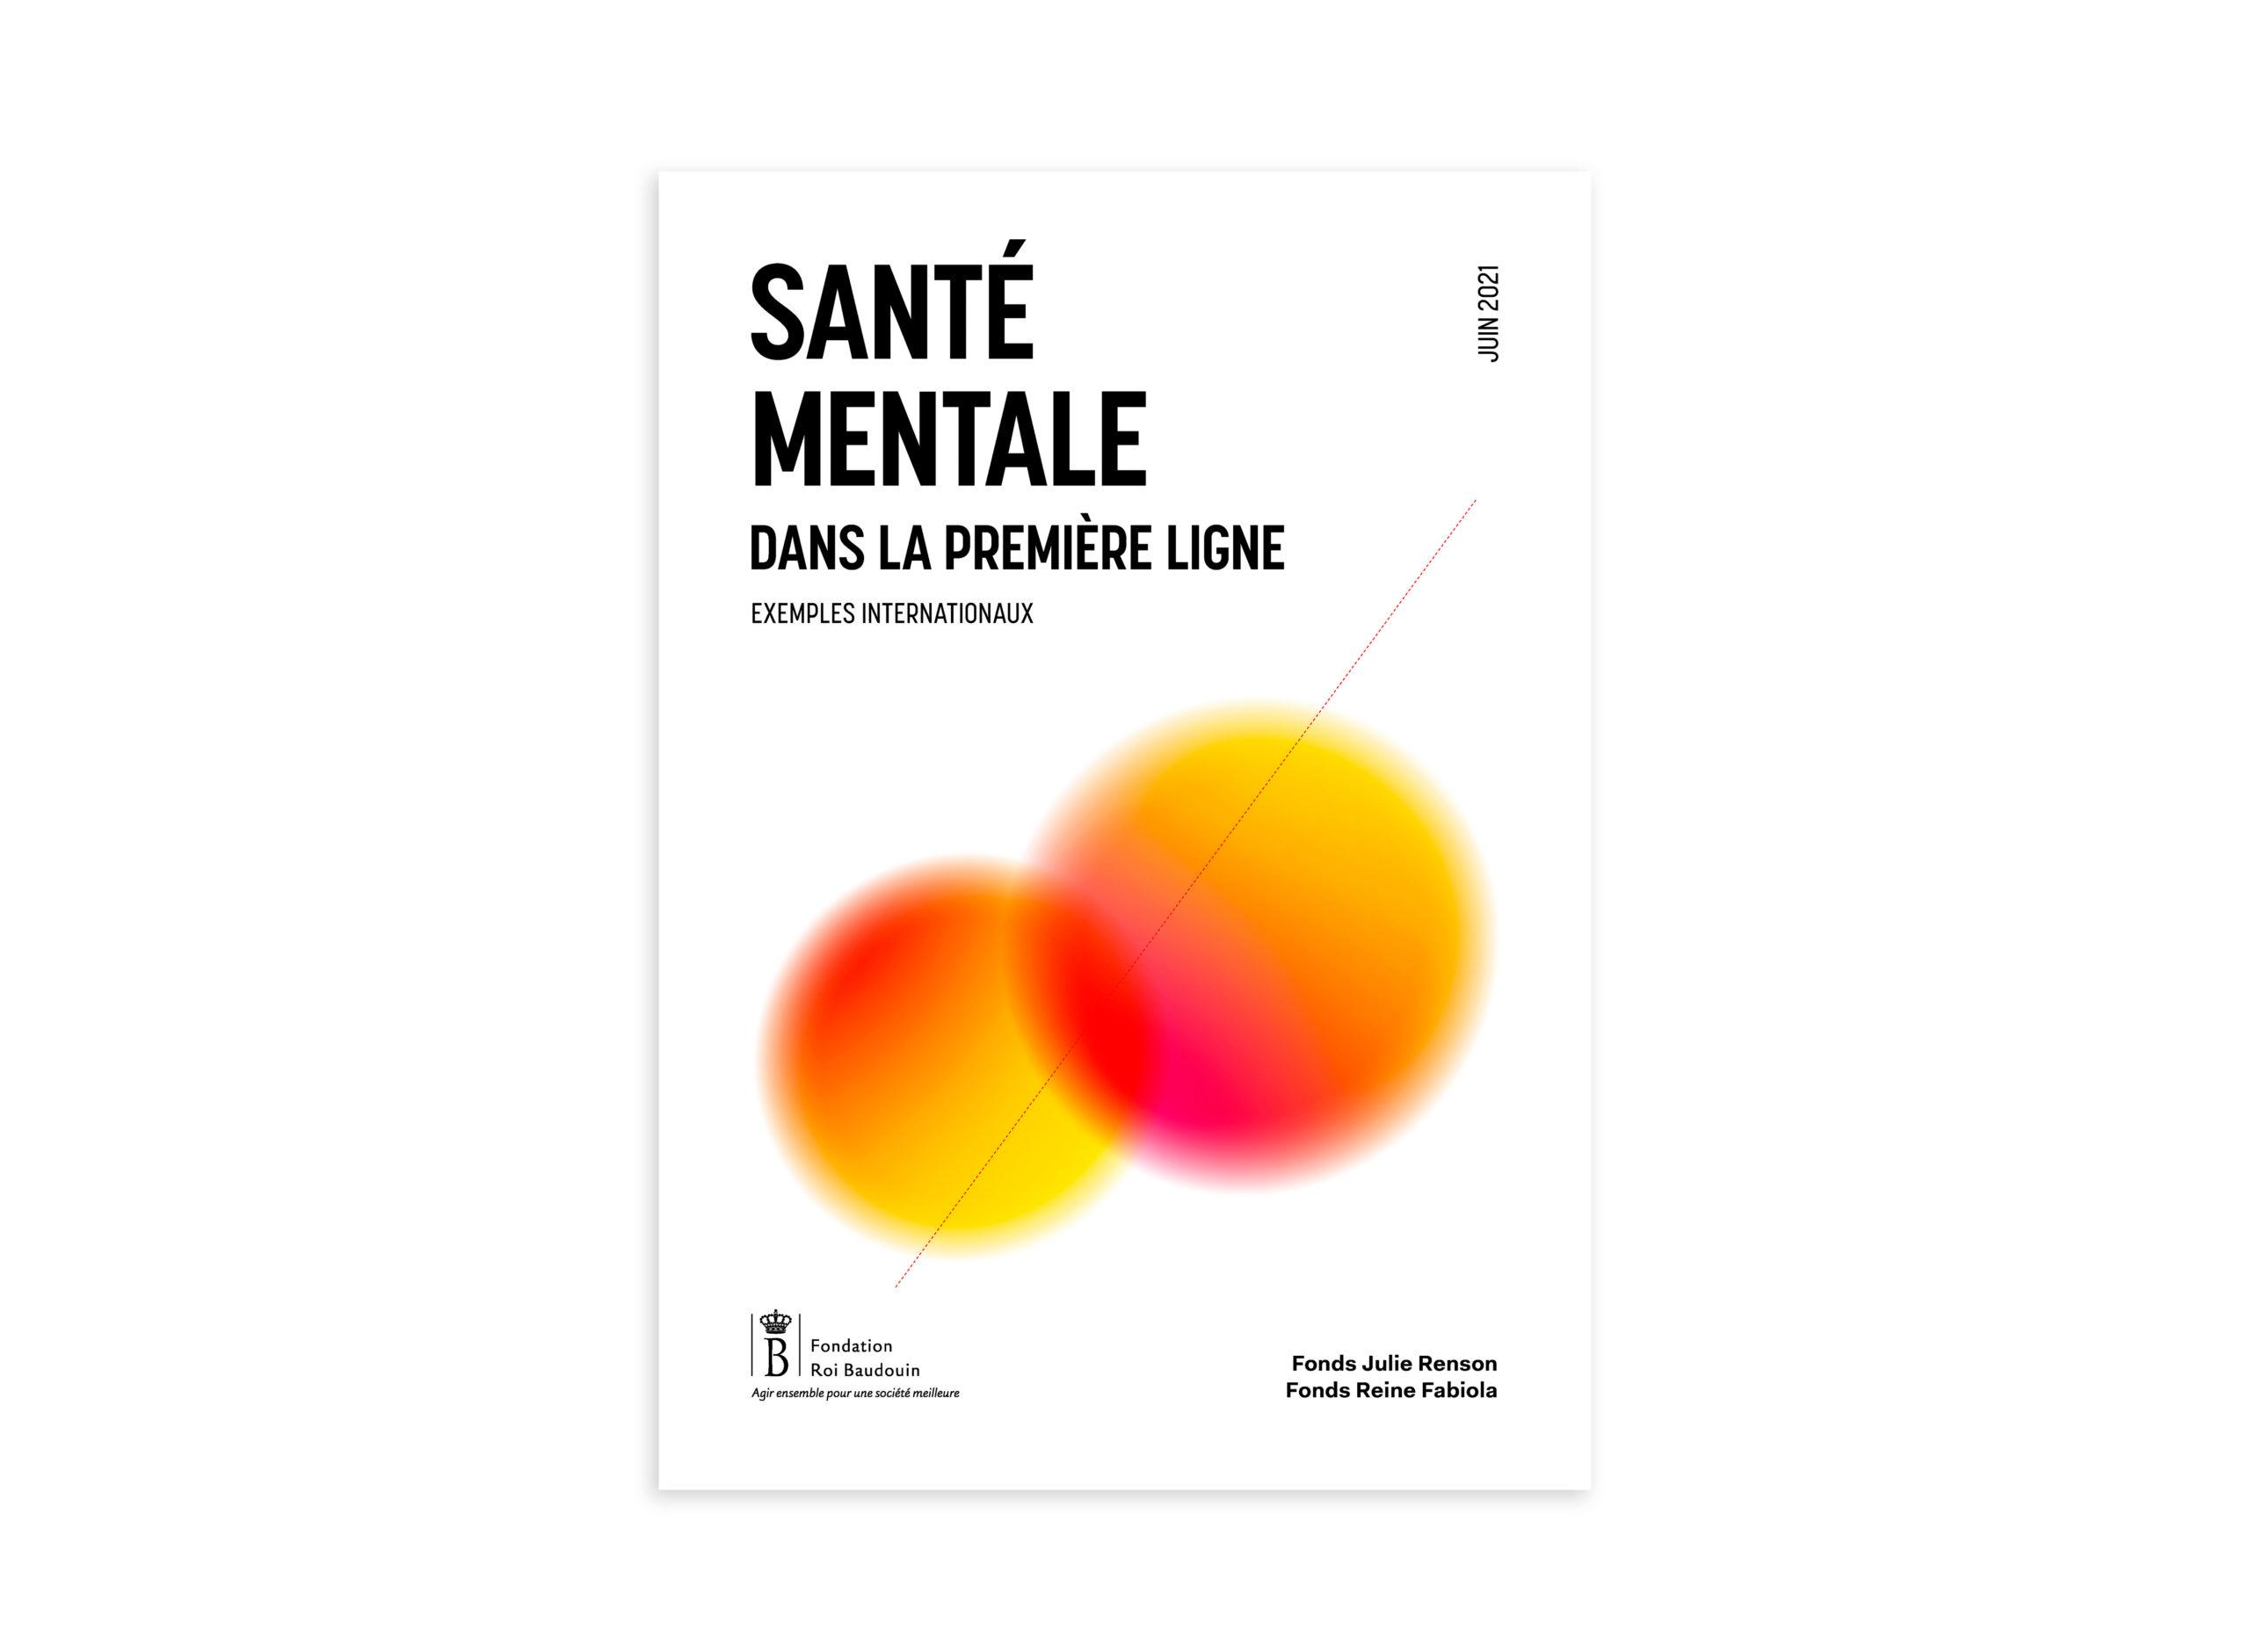 FRB Sante Mentale Brochure Cover